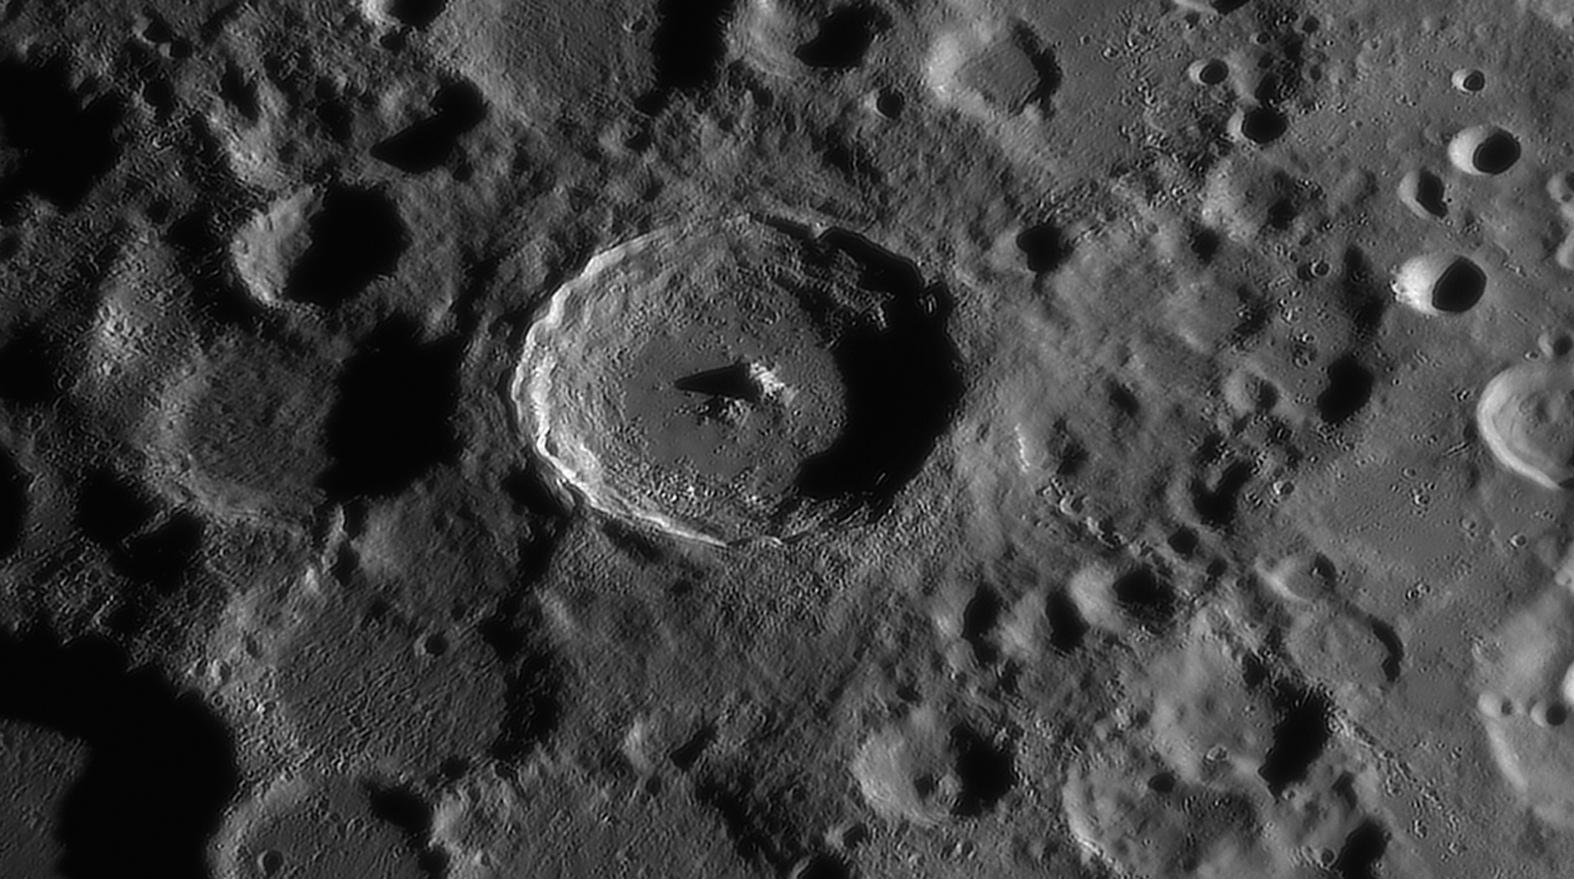 large.Moon_09_10_2020_02_31_39_R_.jpg.d6cb00db2d8d9a612a3a4cb5f9bc8943.jpg